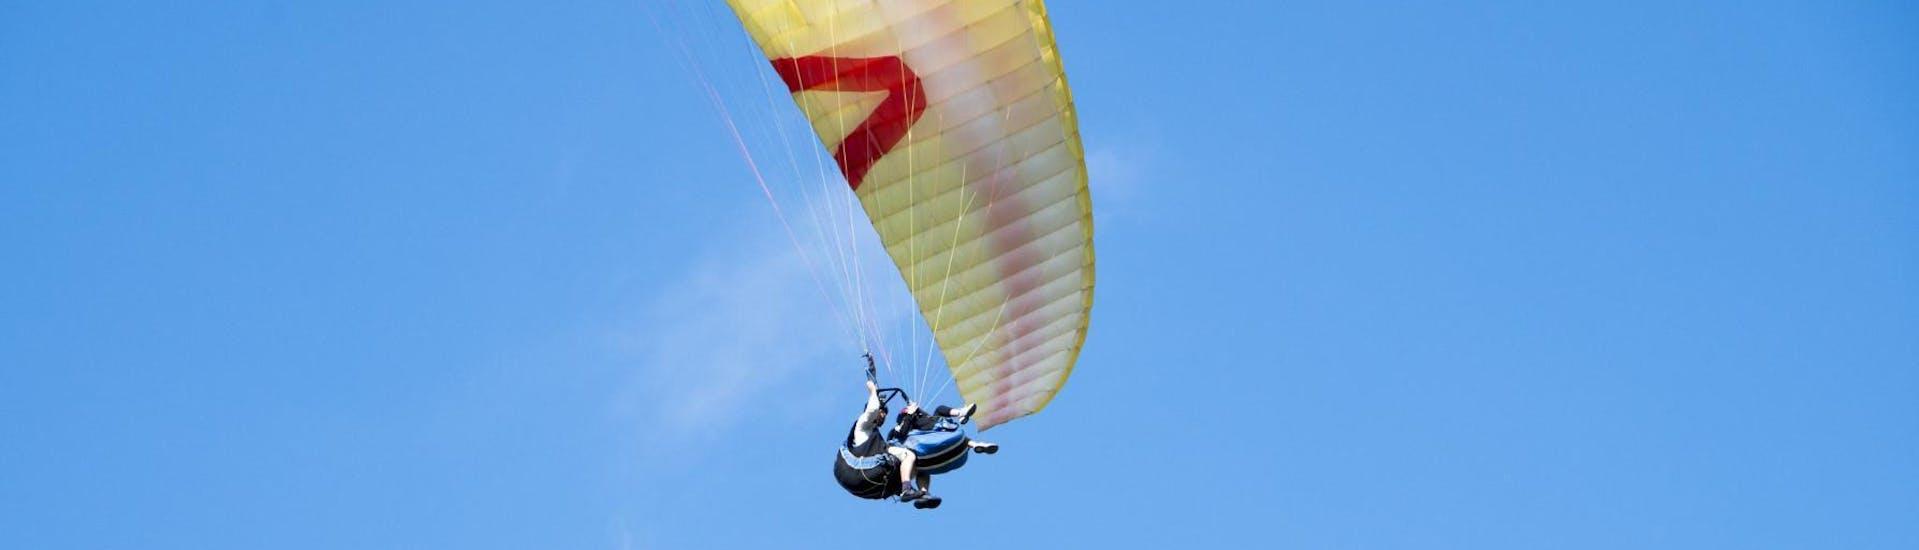 tandem-paragliding-in-plitvice-lakes-national-park-sky-riders-paragliding-croatia-hero